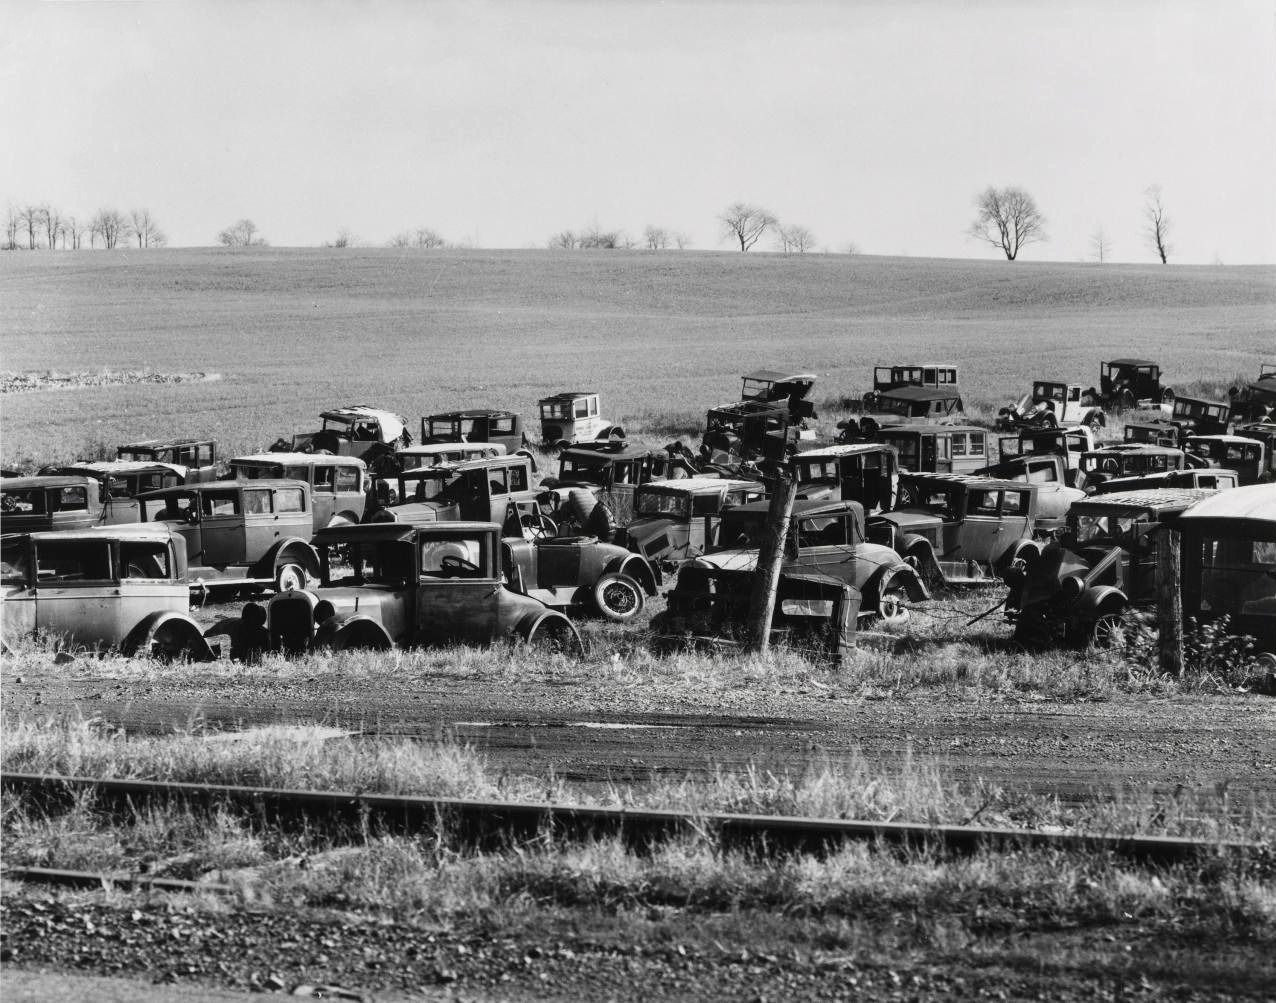 Walker Evans. Auto dump, near Easton, Pennsylvania. 1935